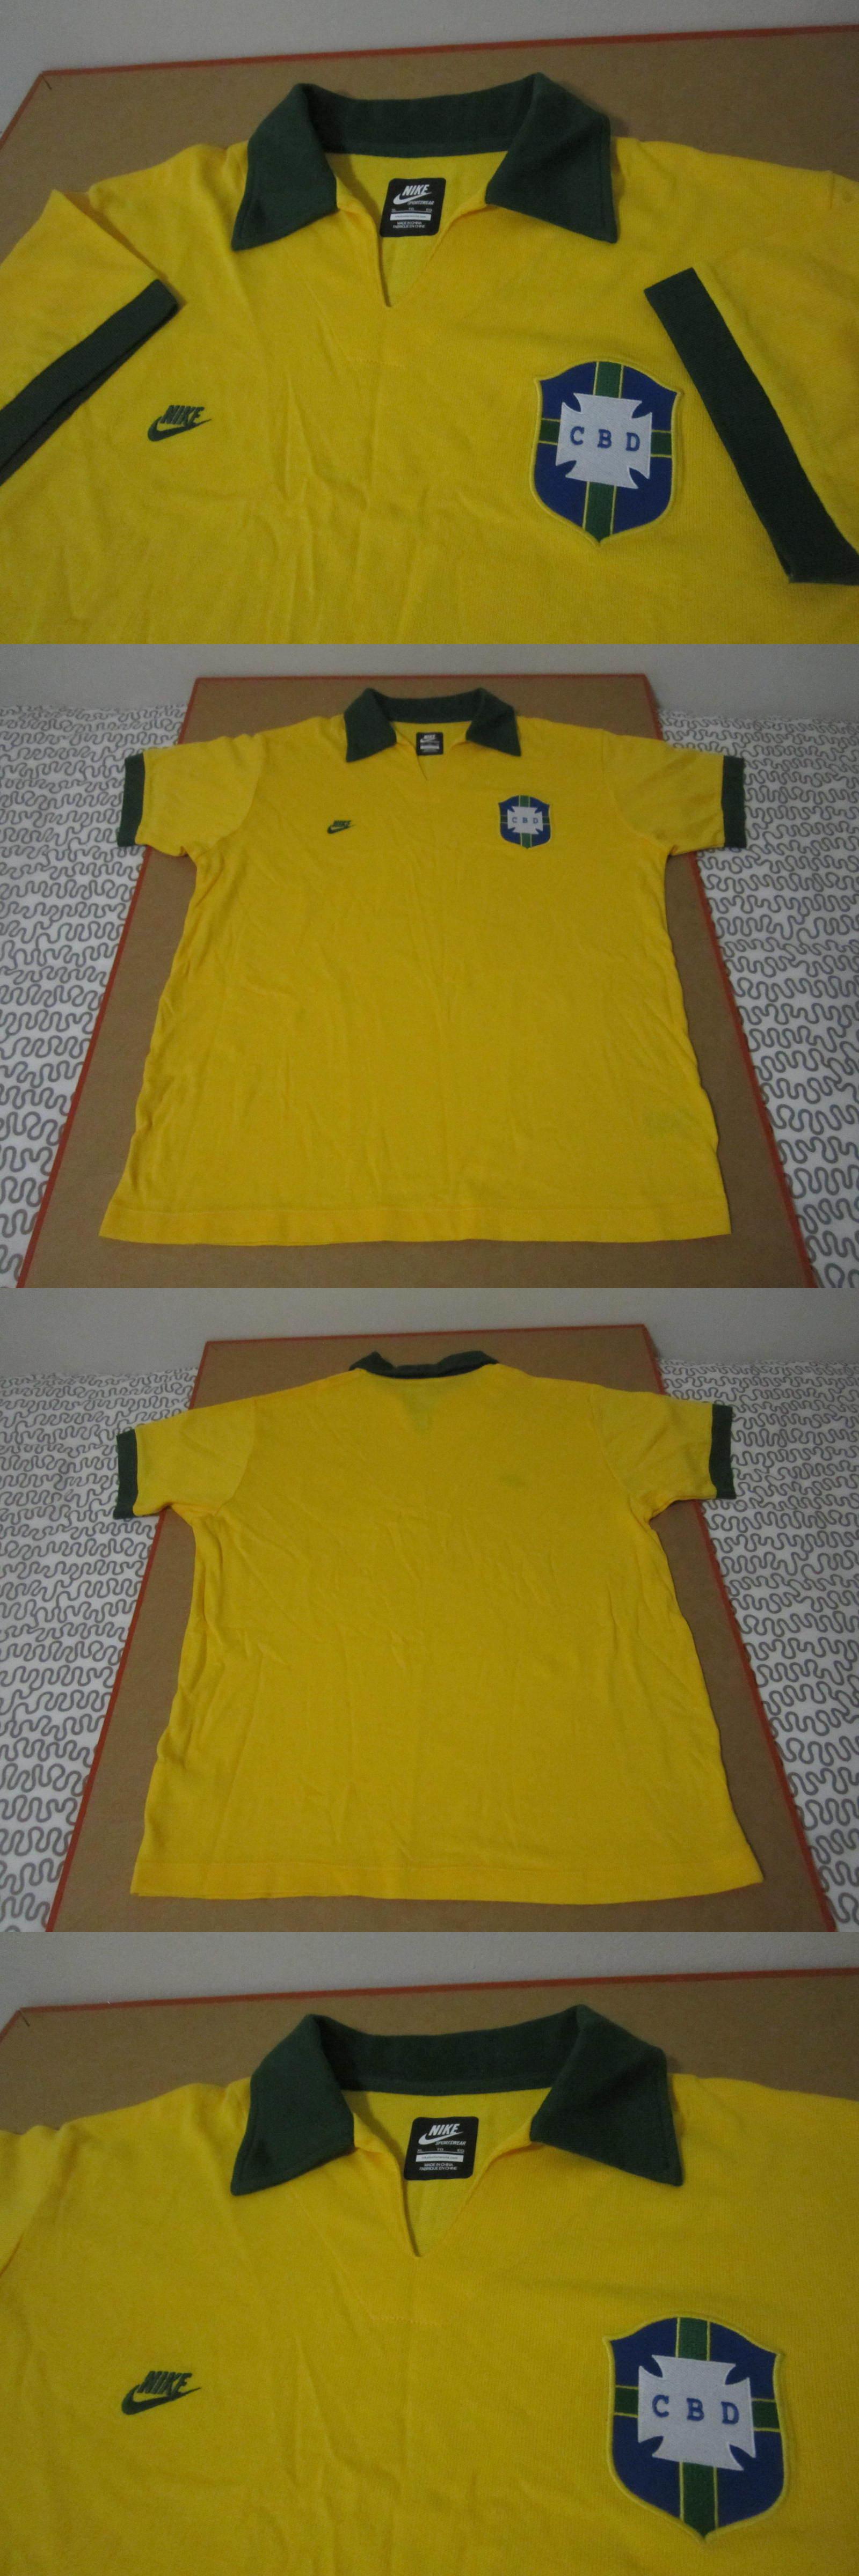 7594882f96e ... Soccer-National Teams 2891 Nike Cbd Brasil Brazil Soccer Jersey Futbol  Shirt Polo Collar ...